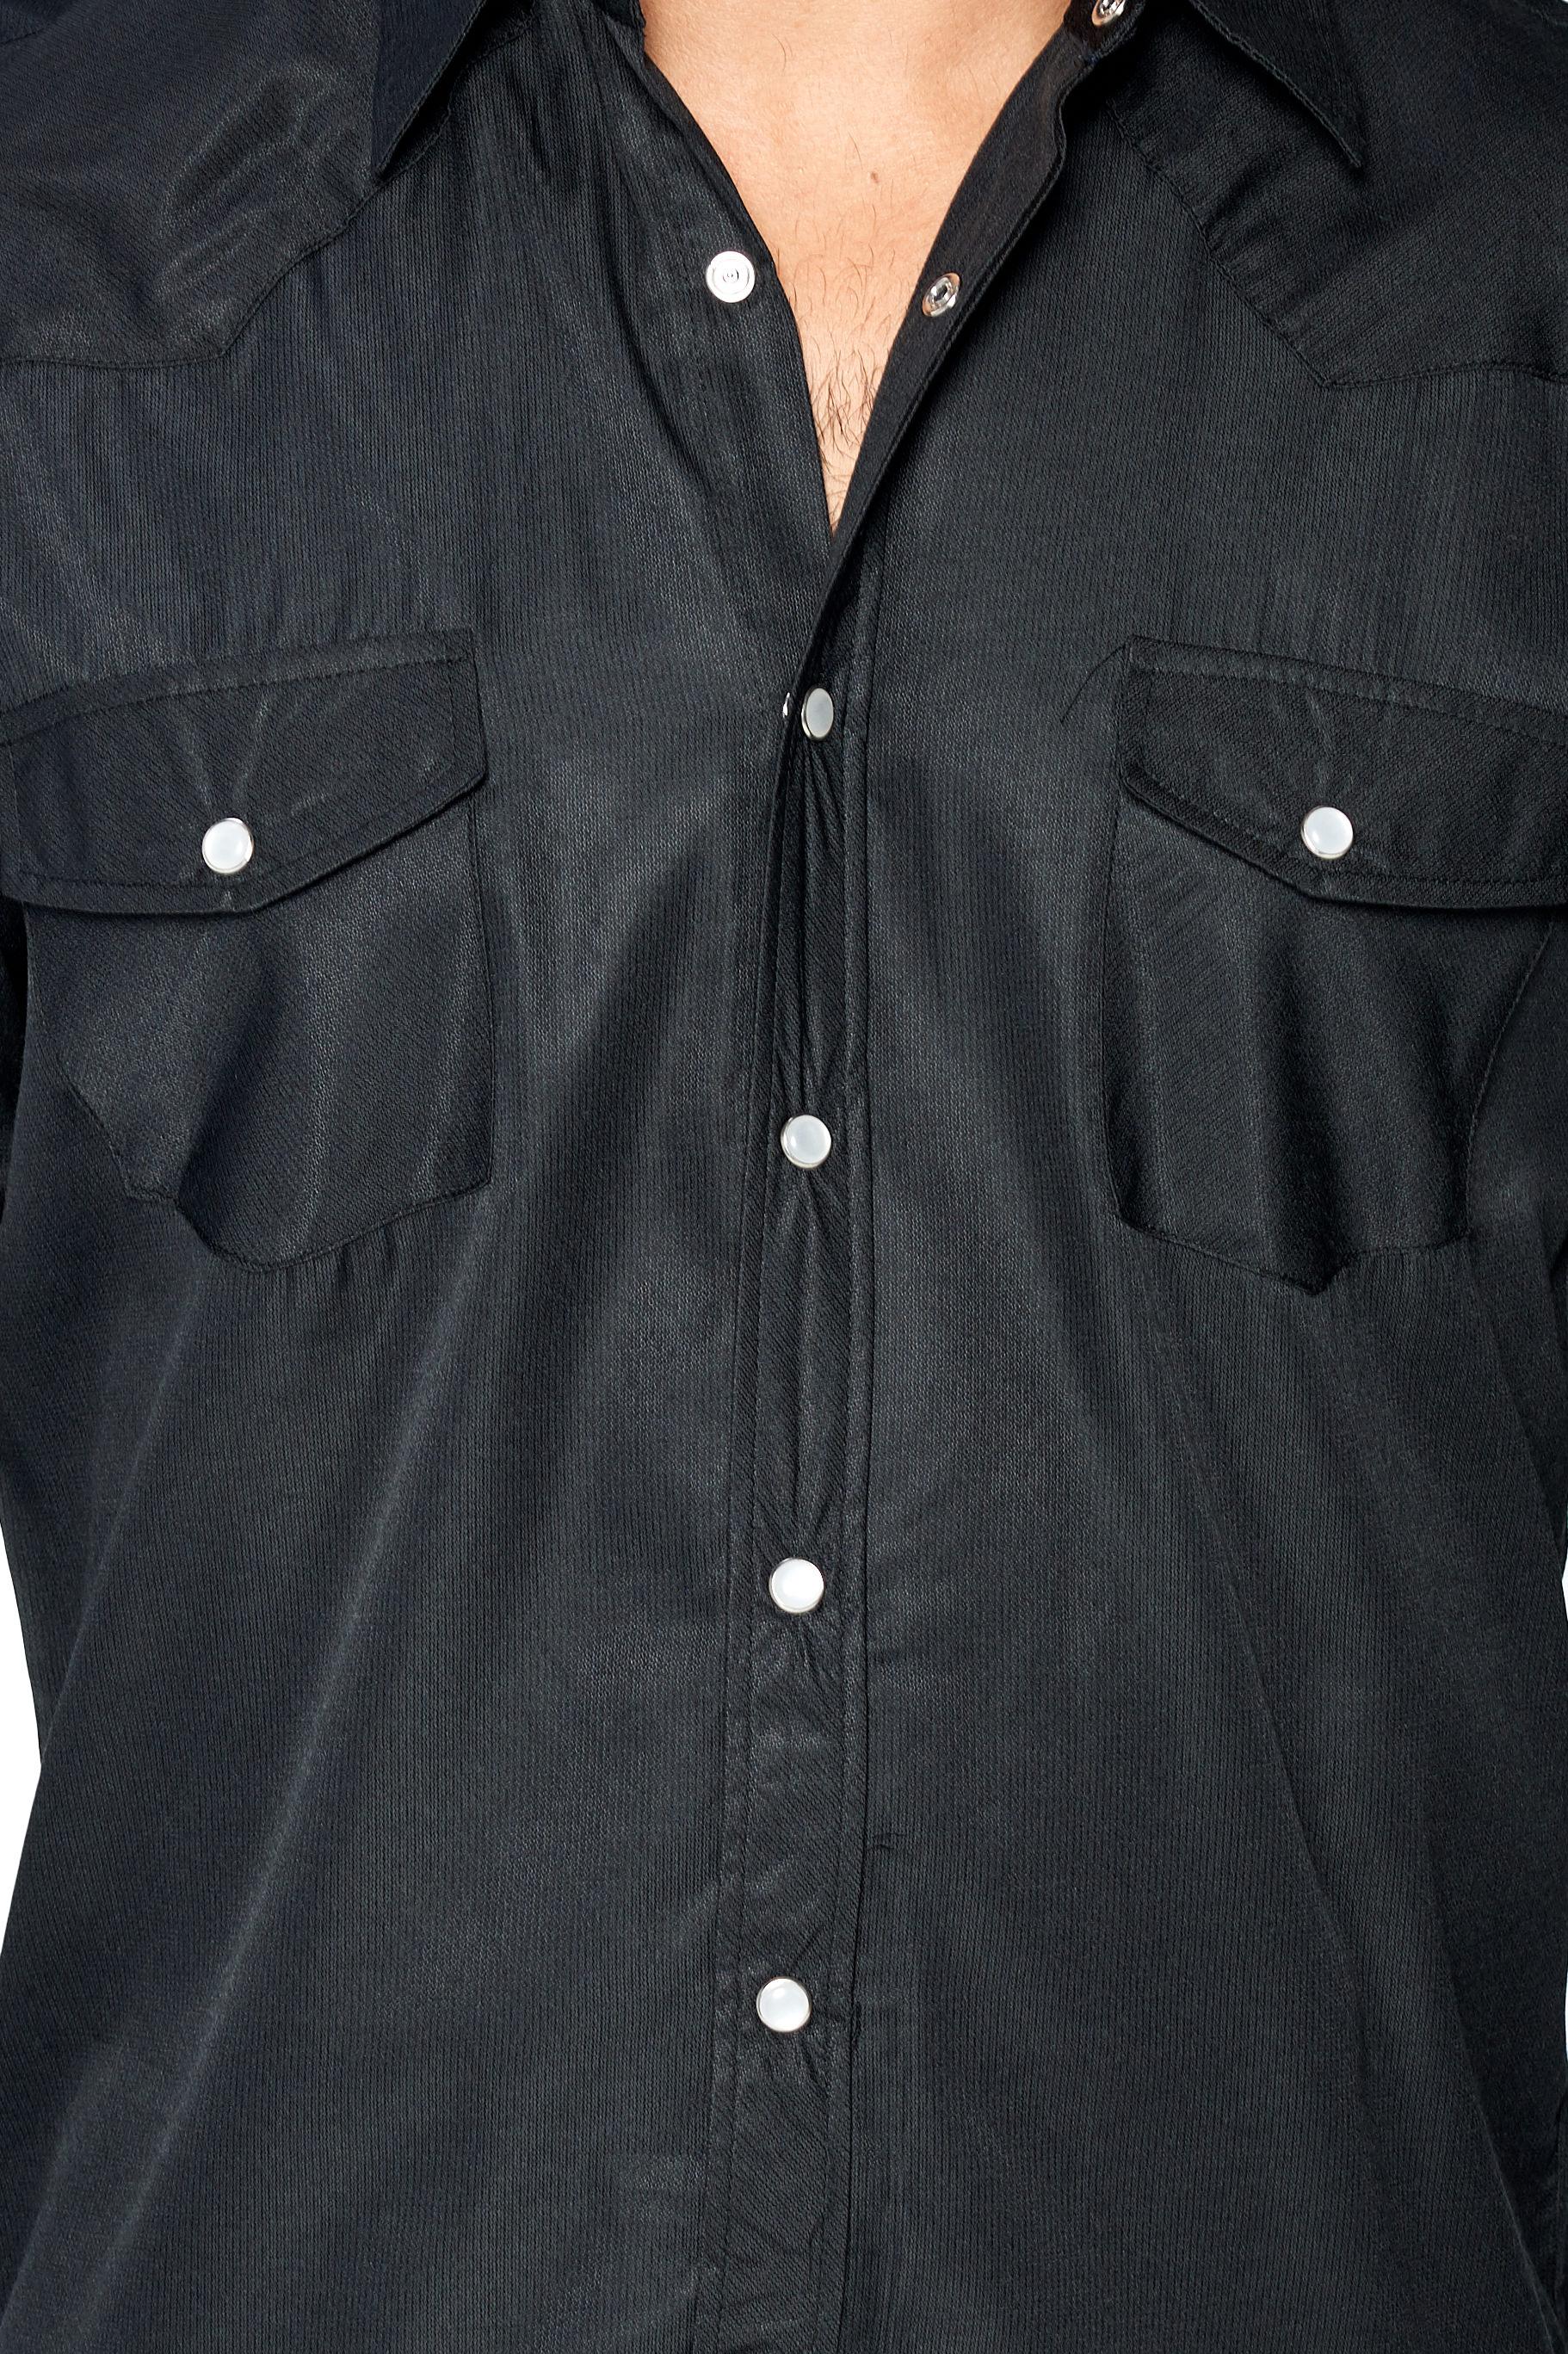 LW-Men-039-s-Pearl-Snap-Tribal-Stylish-Printed-Woven-Western-Vaquero-Rodeo-Shirt thumbnail 49